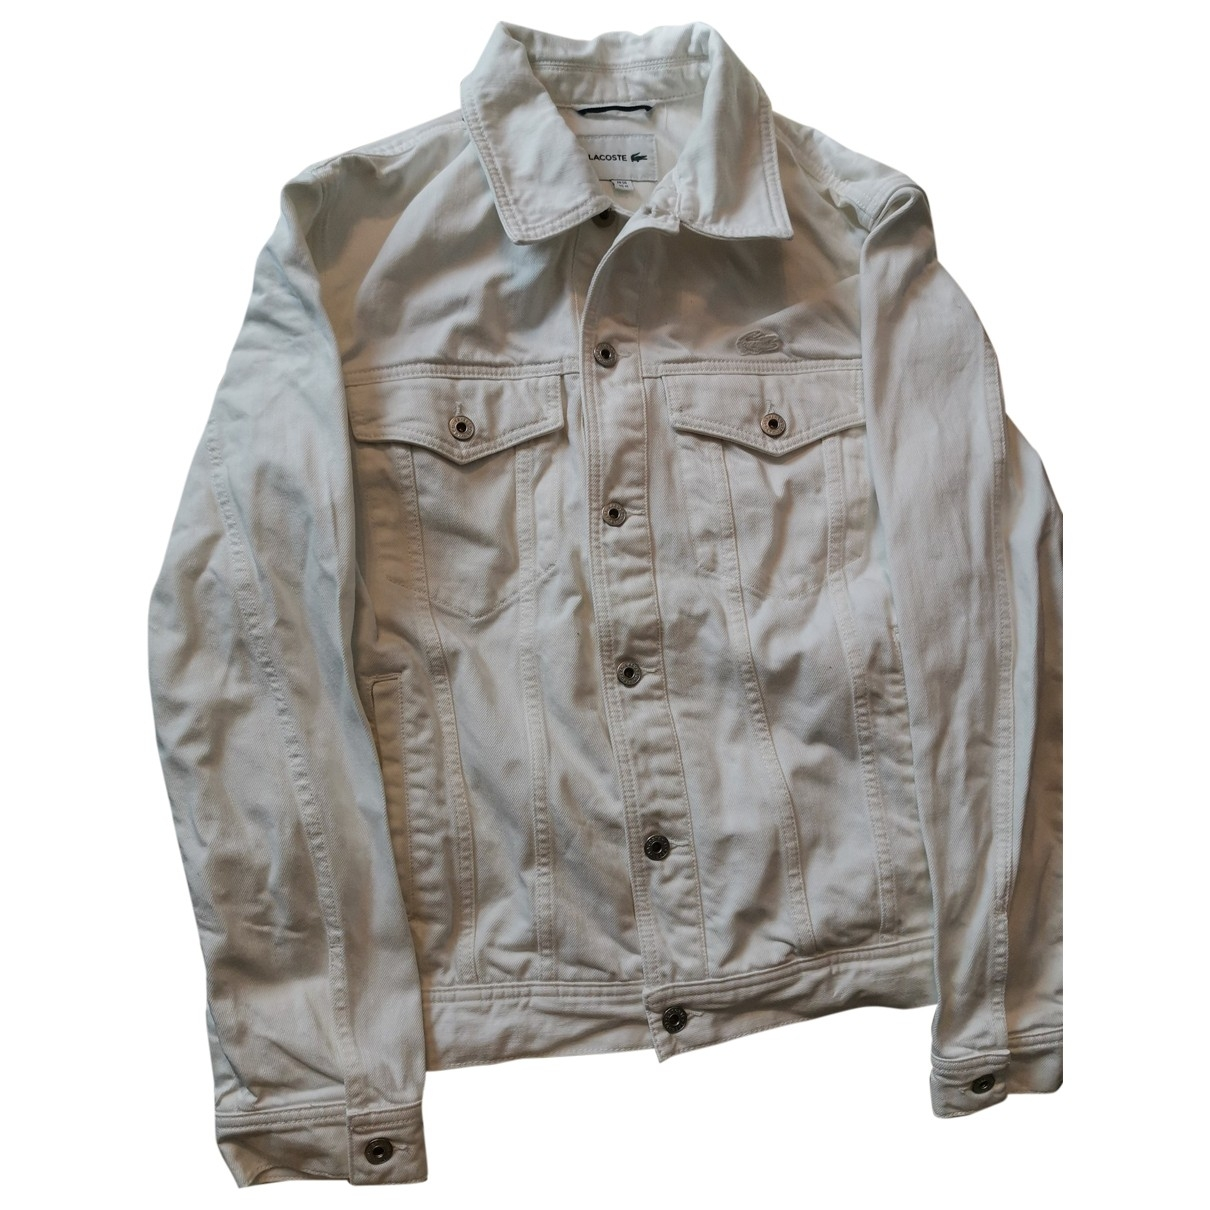 Lacoste \N White Cotton jacket  for Men M International